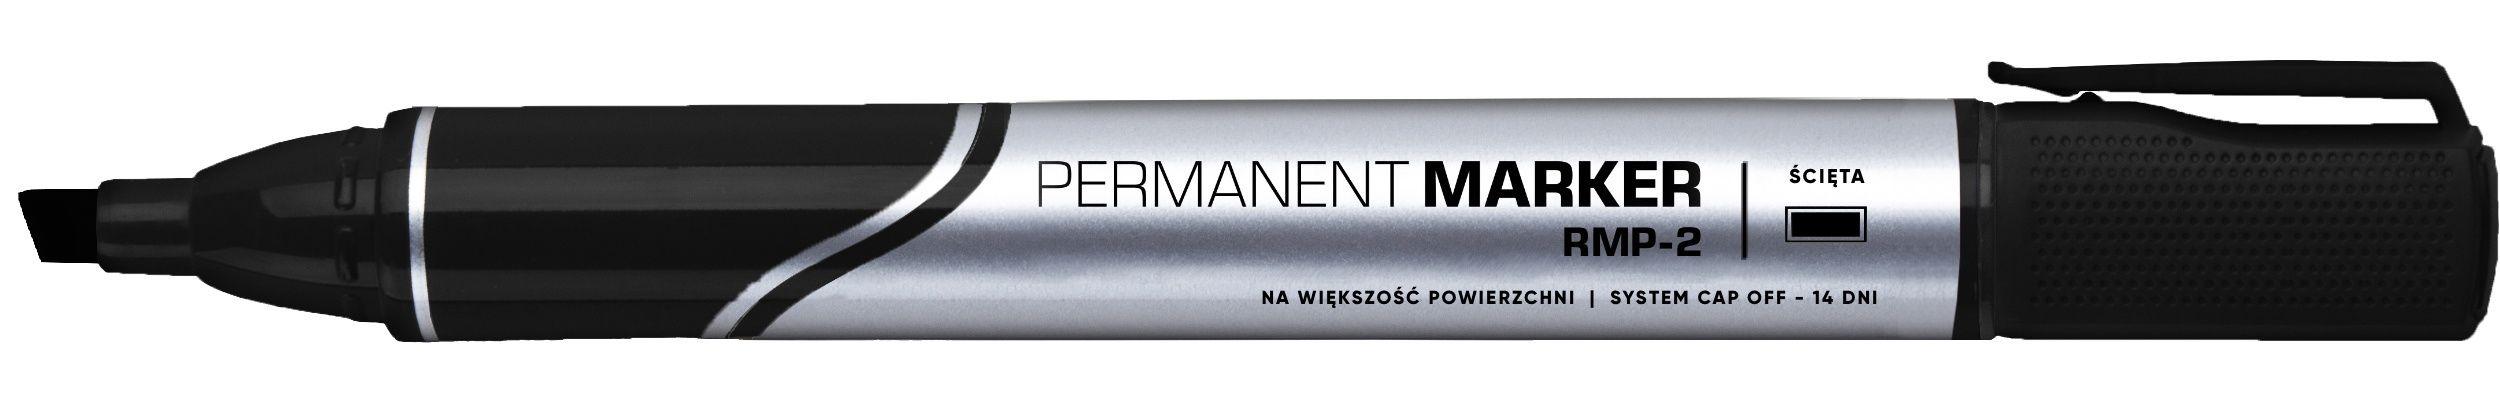 RMP-2 Permanent Marker